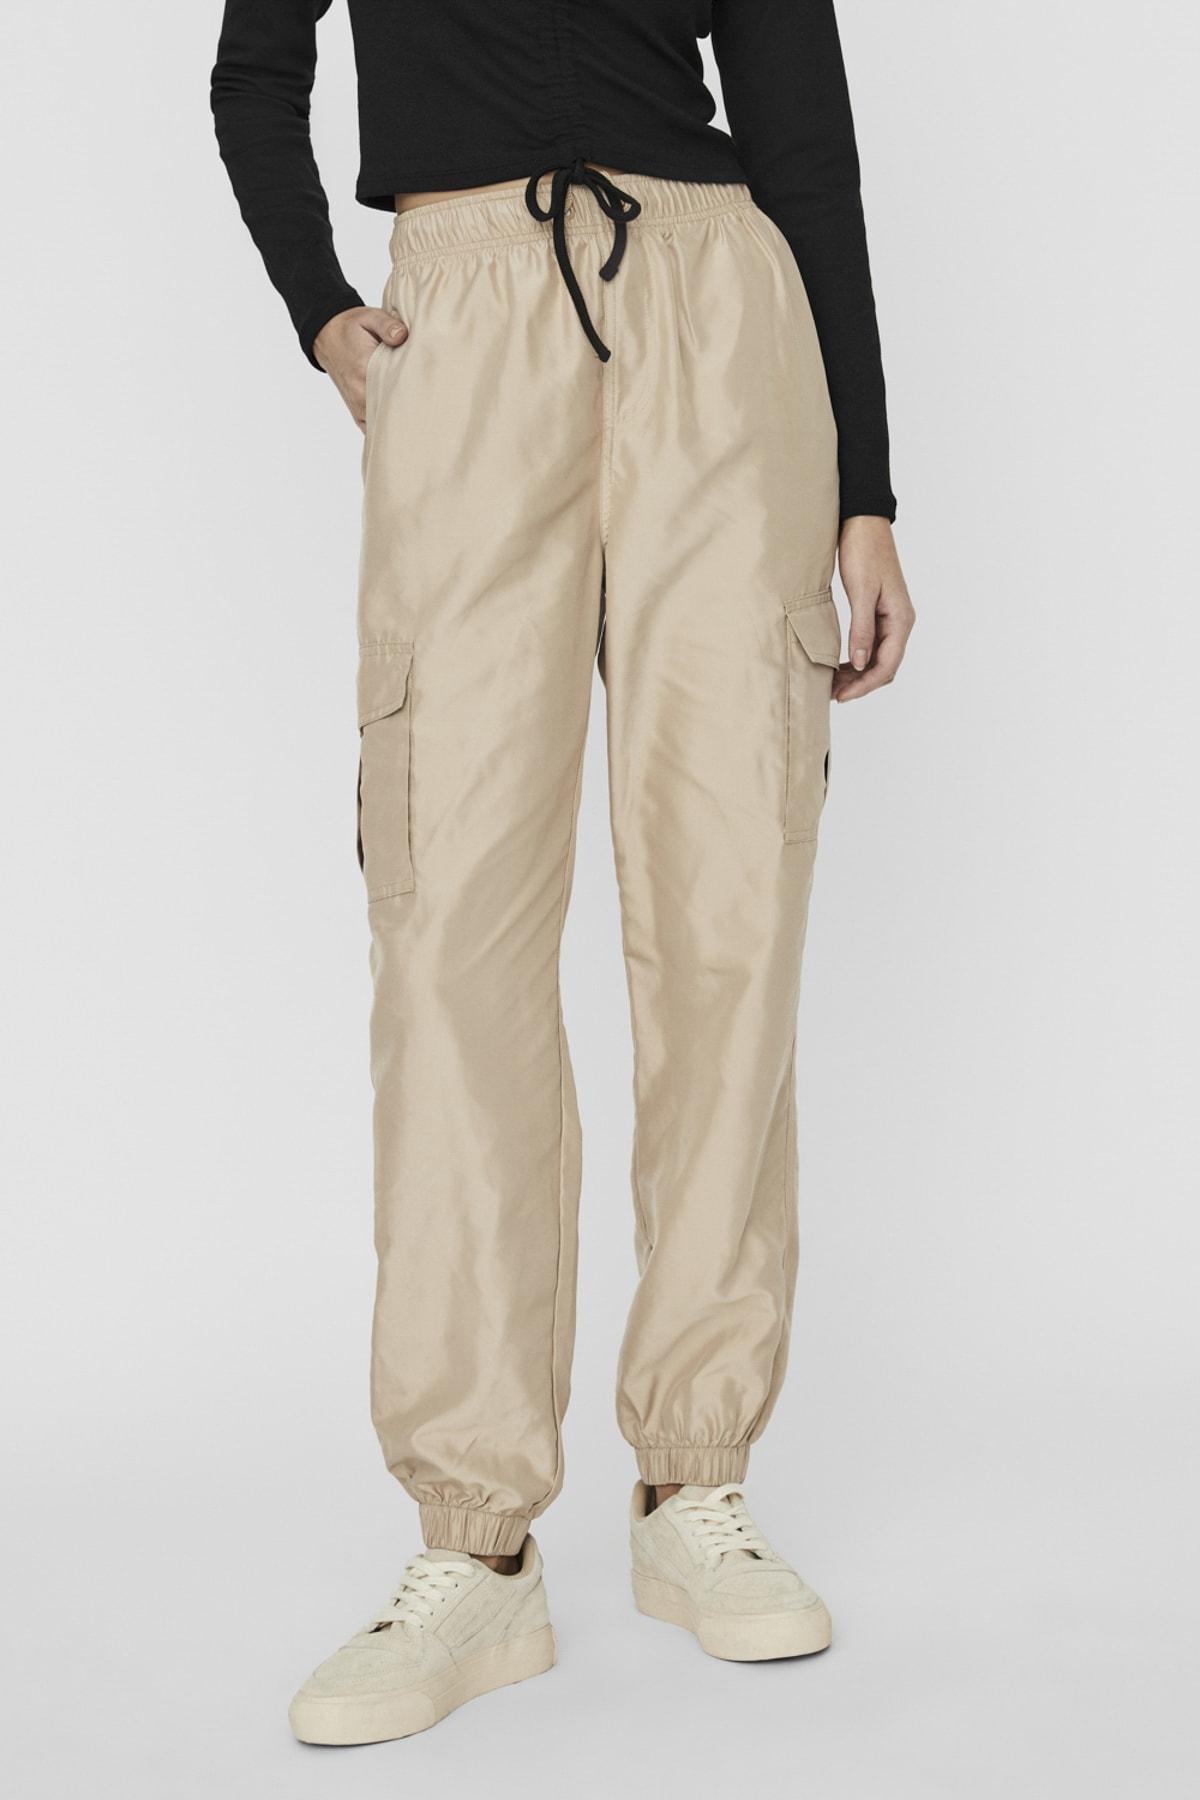 Vero Moda Kadın Bej Paçası Lastikli Paraşüt Kumaş Pantolon 10225923 VMSIENNA 1